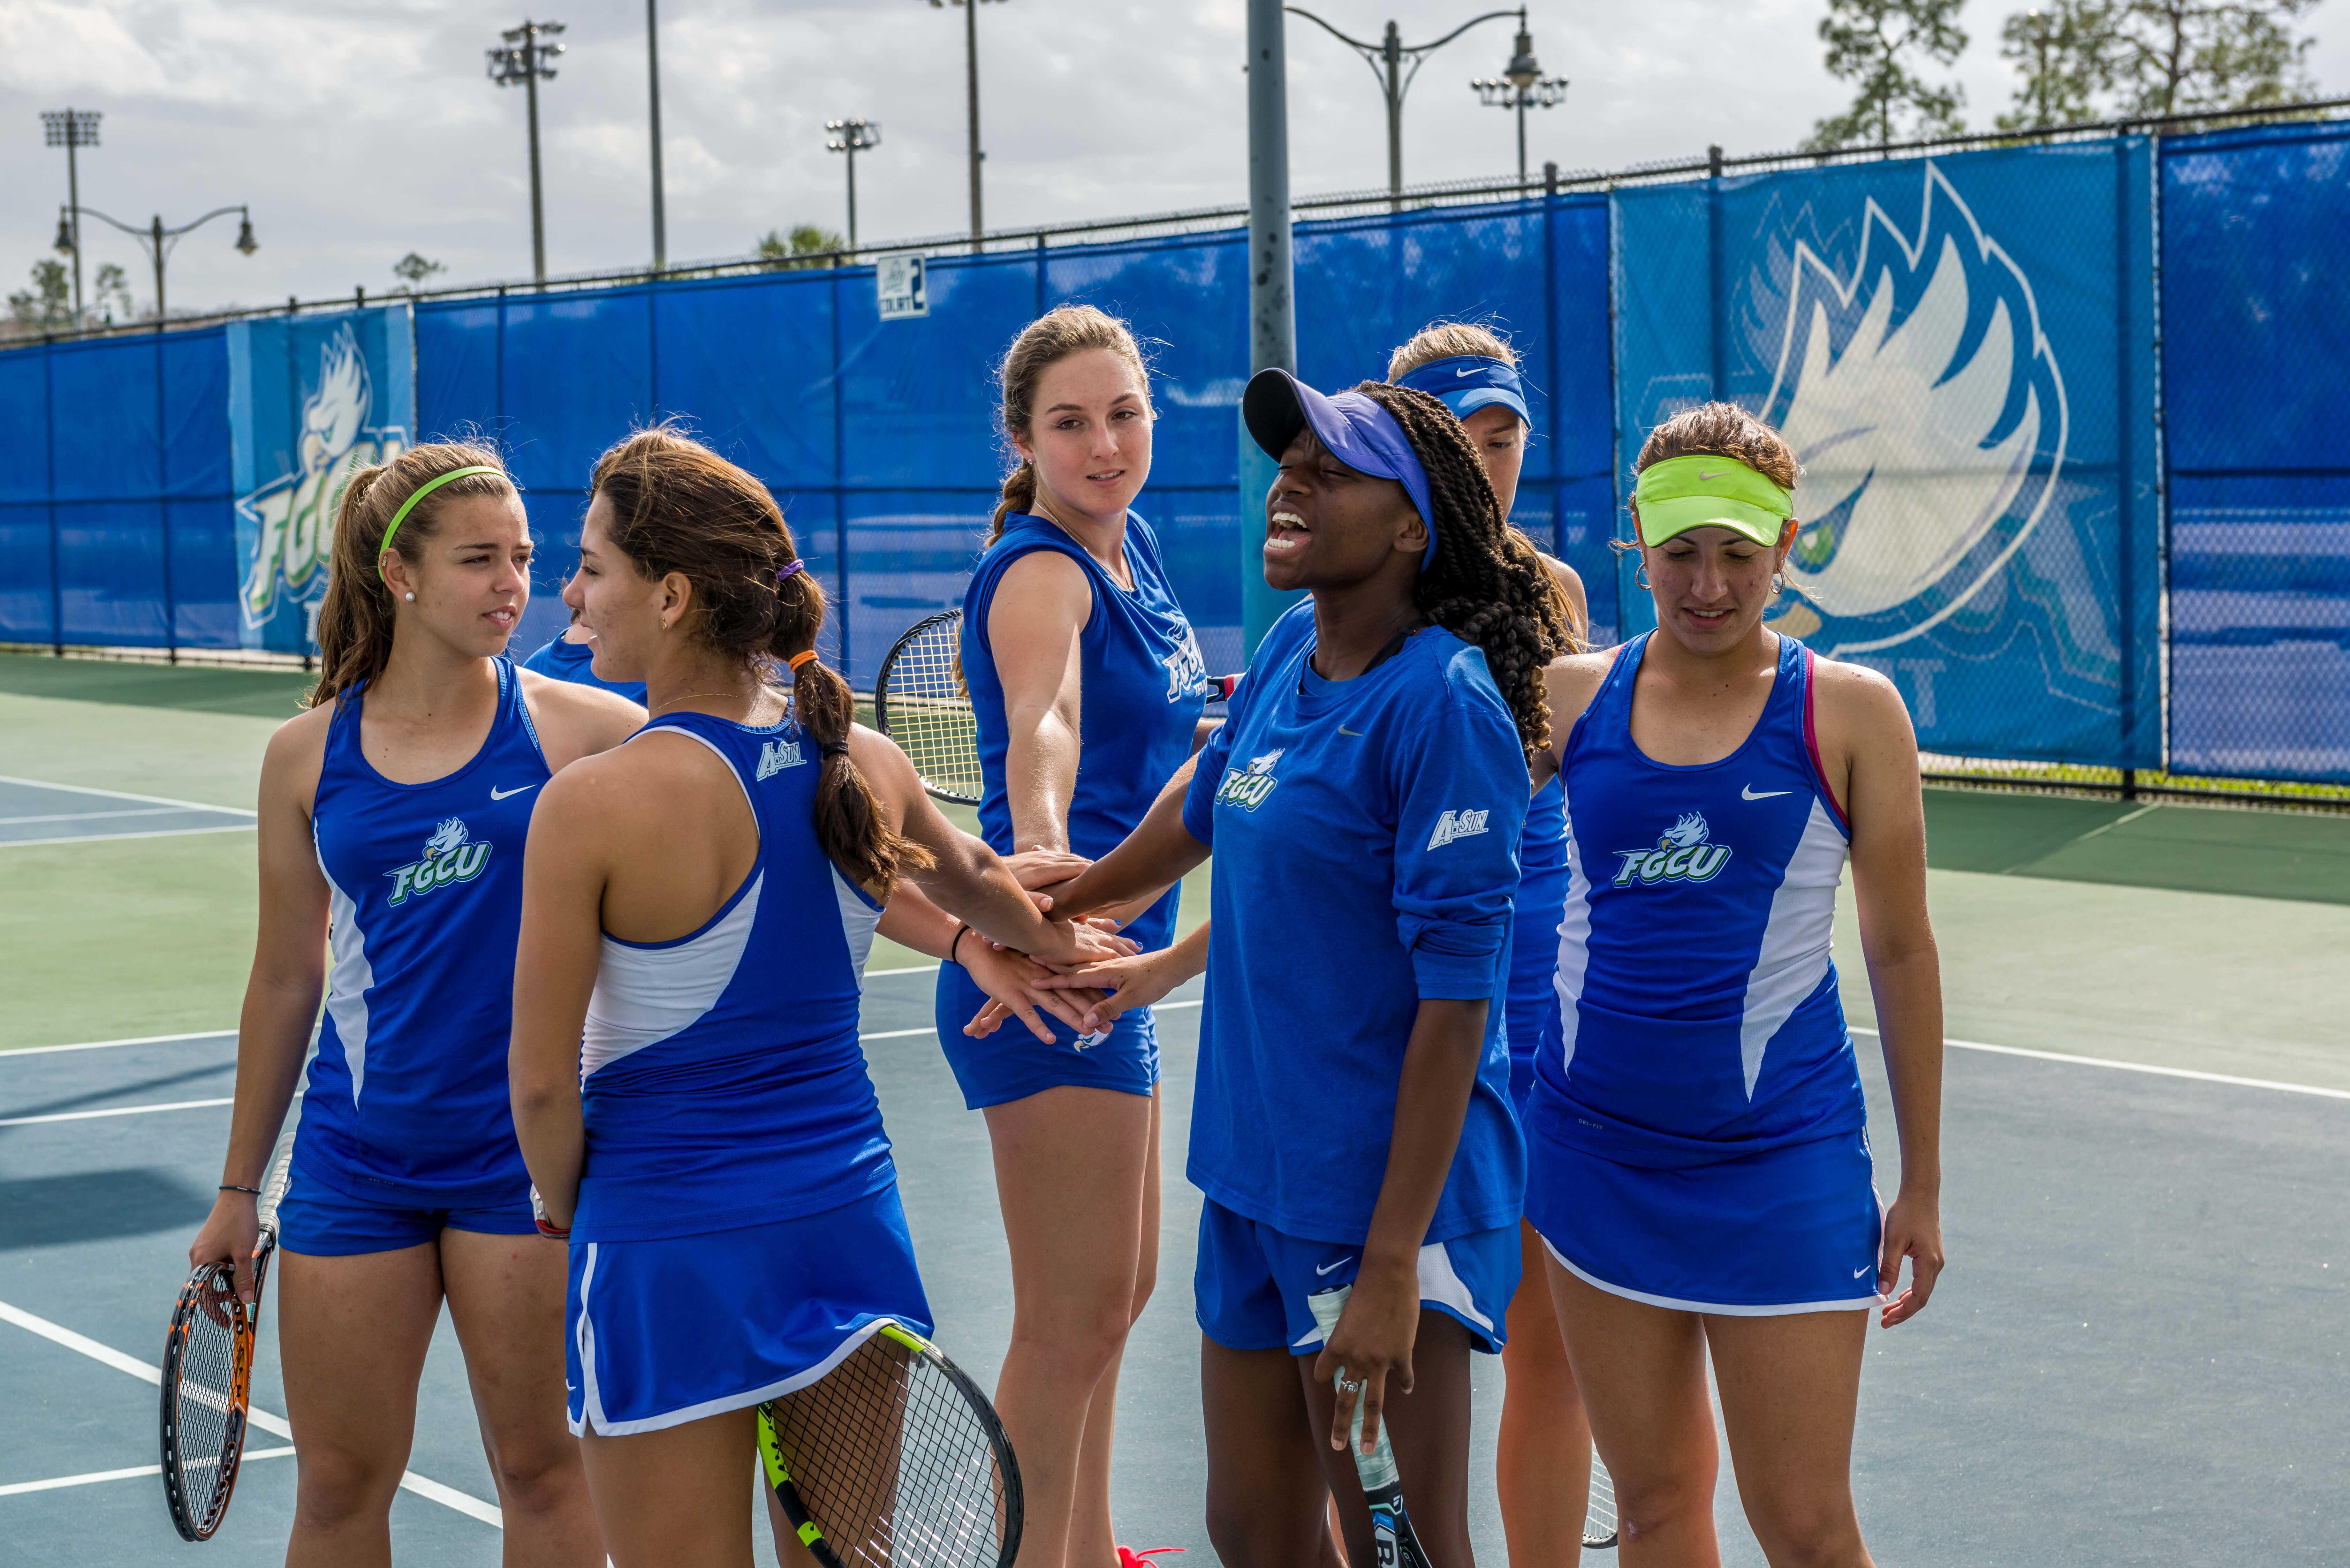 NC State 'challenges' FGCU women's tennis